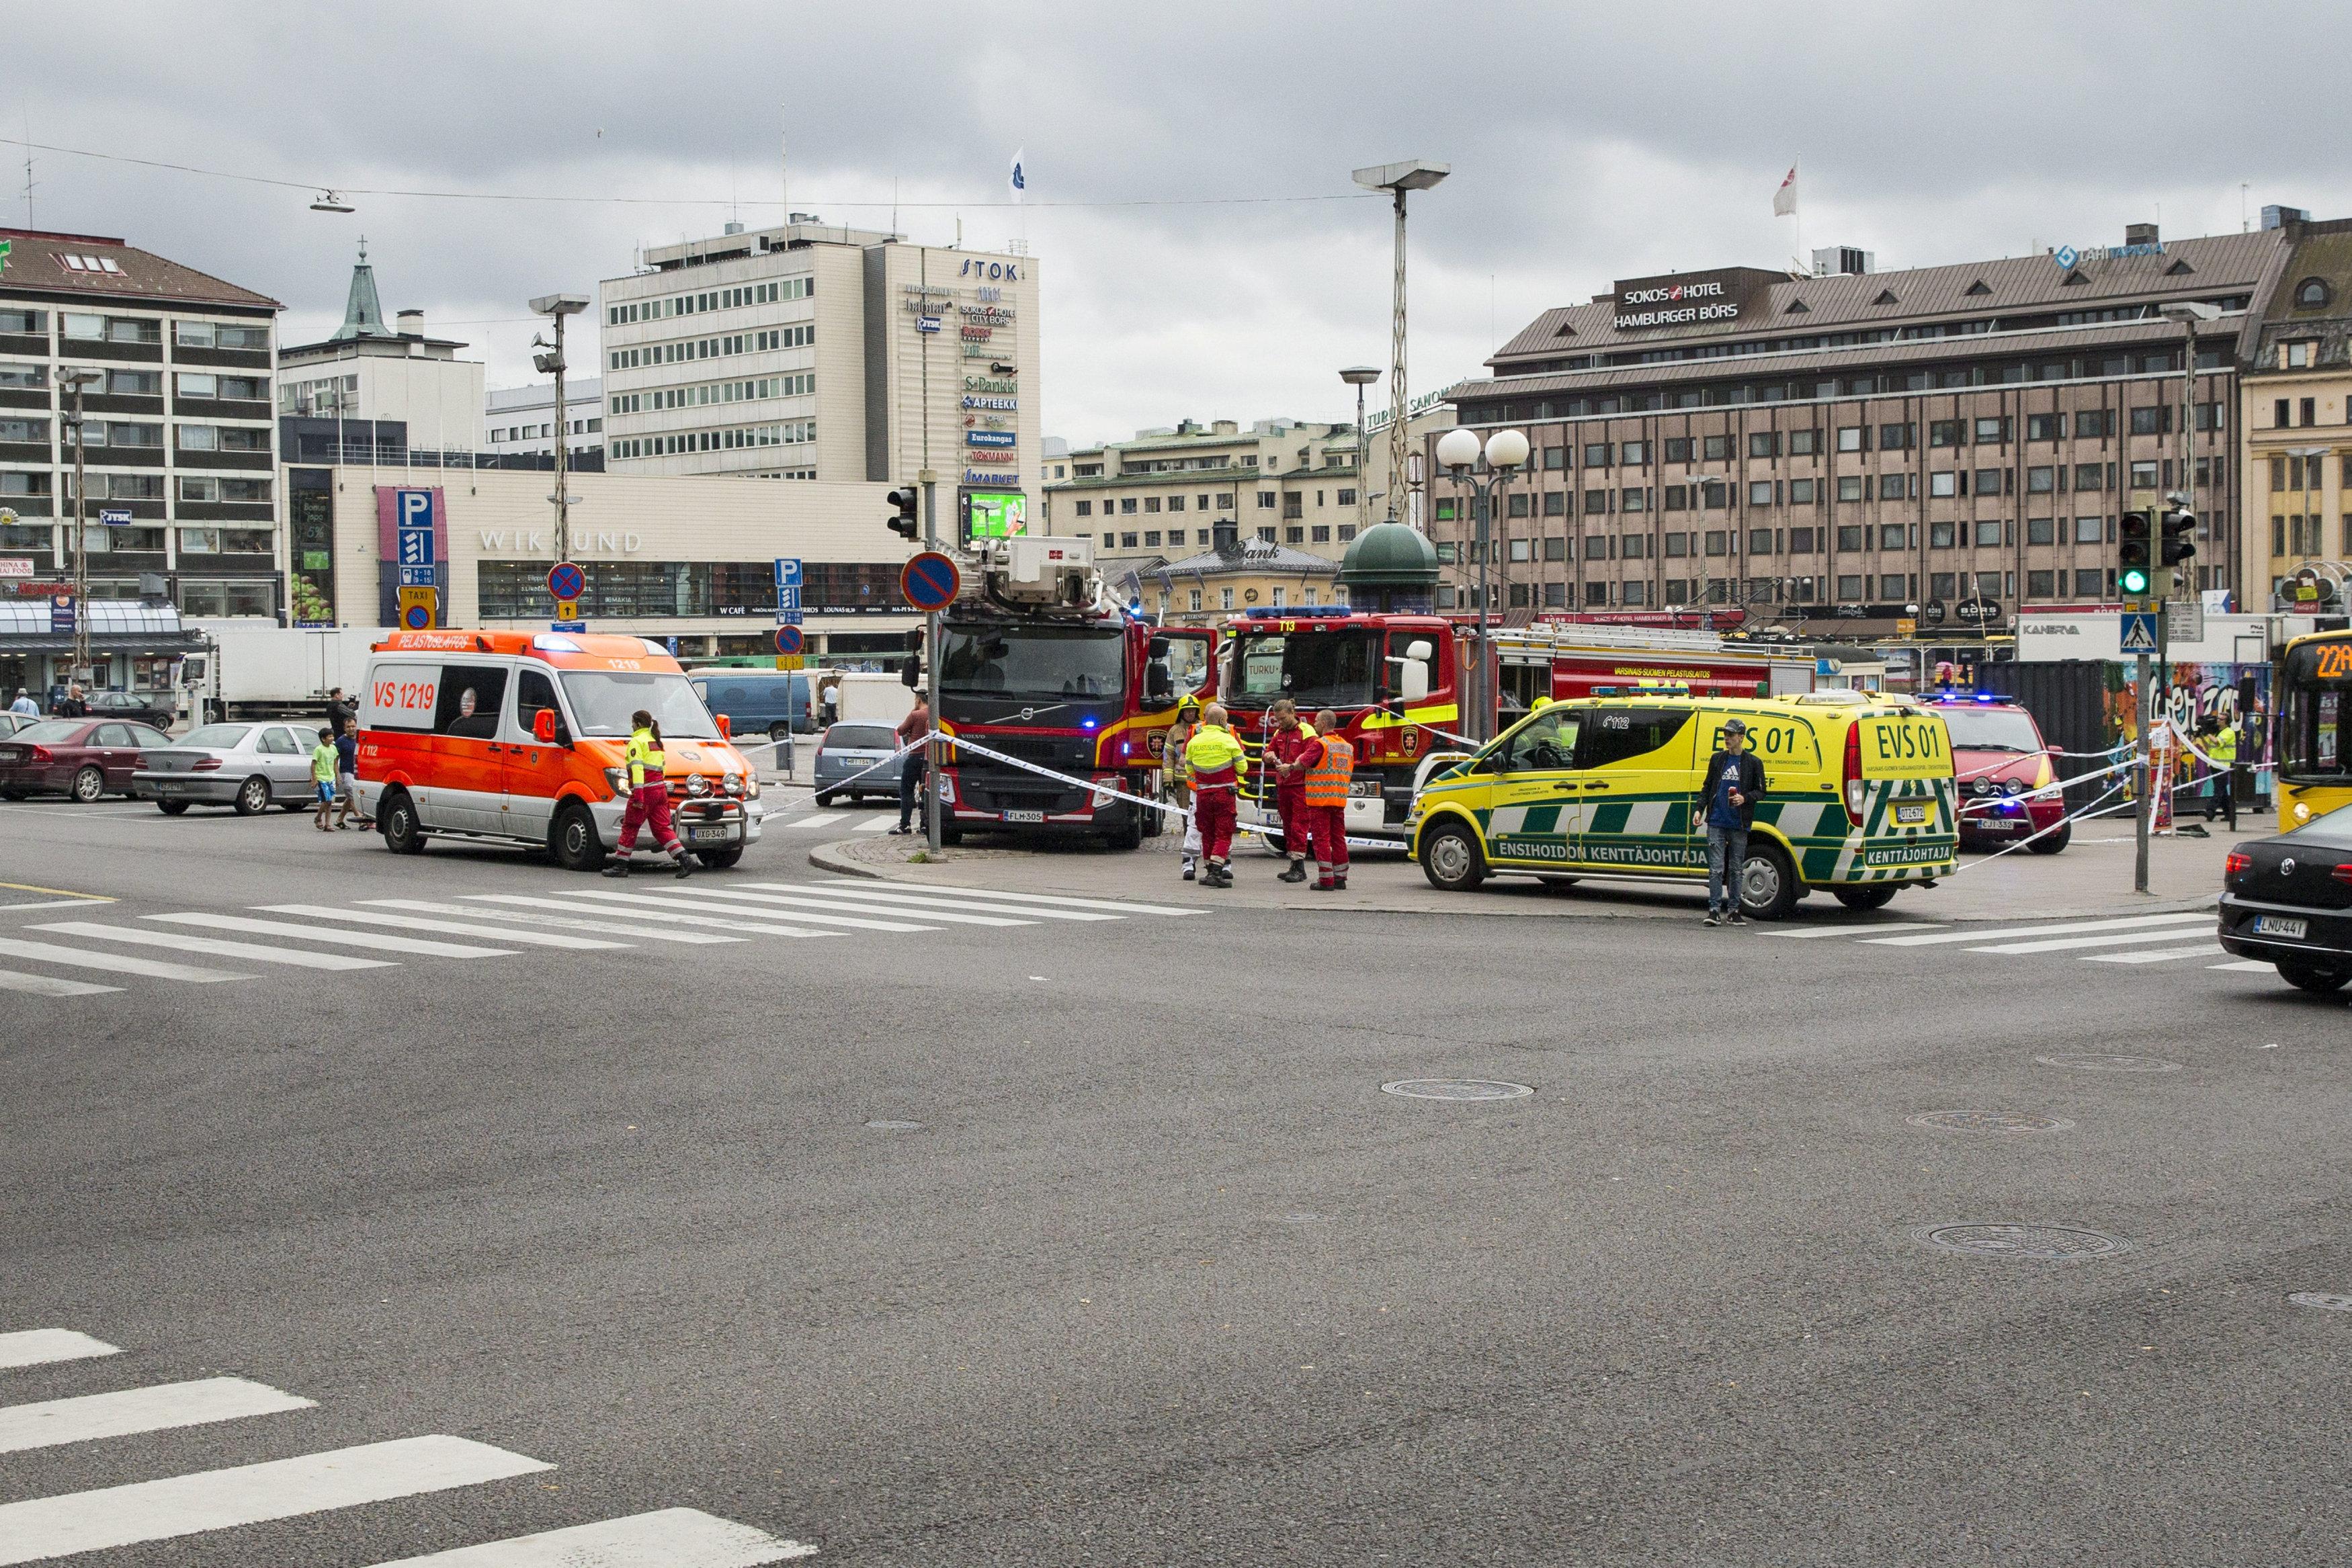 Rescue personnel cordon the place where several people were stabbed, at Turku Market Square, Finland August 18, 2017. LEHTIKUVA/Roni Lehti via REUTERS